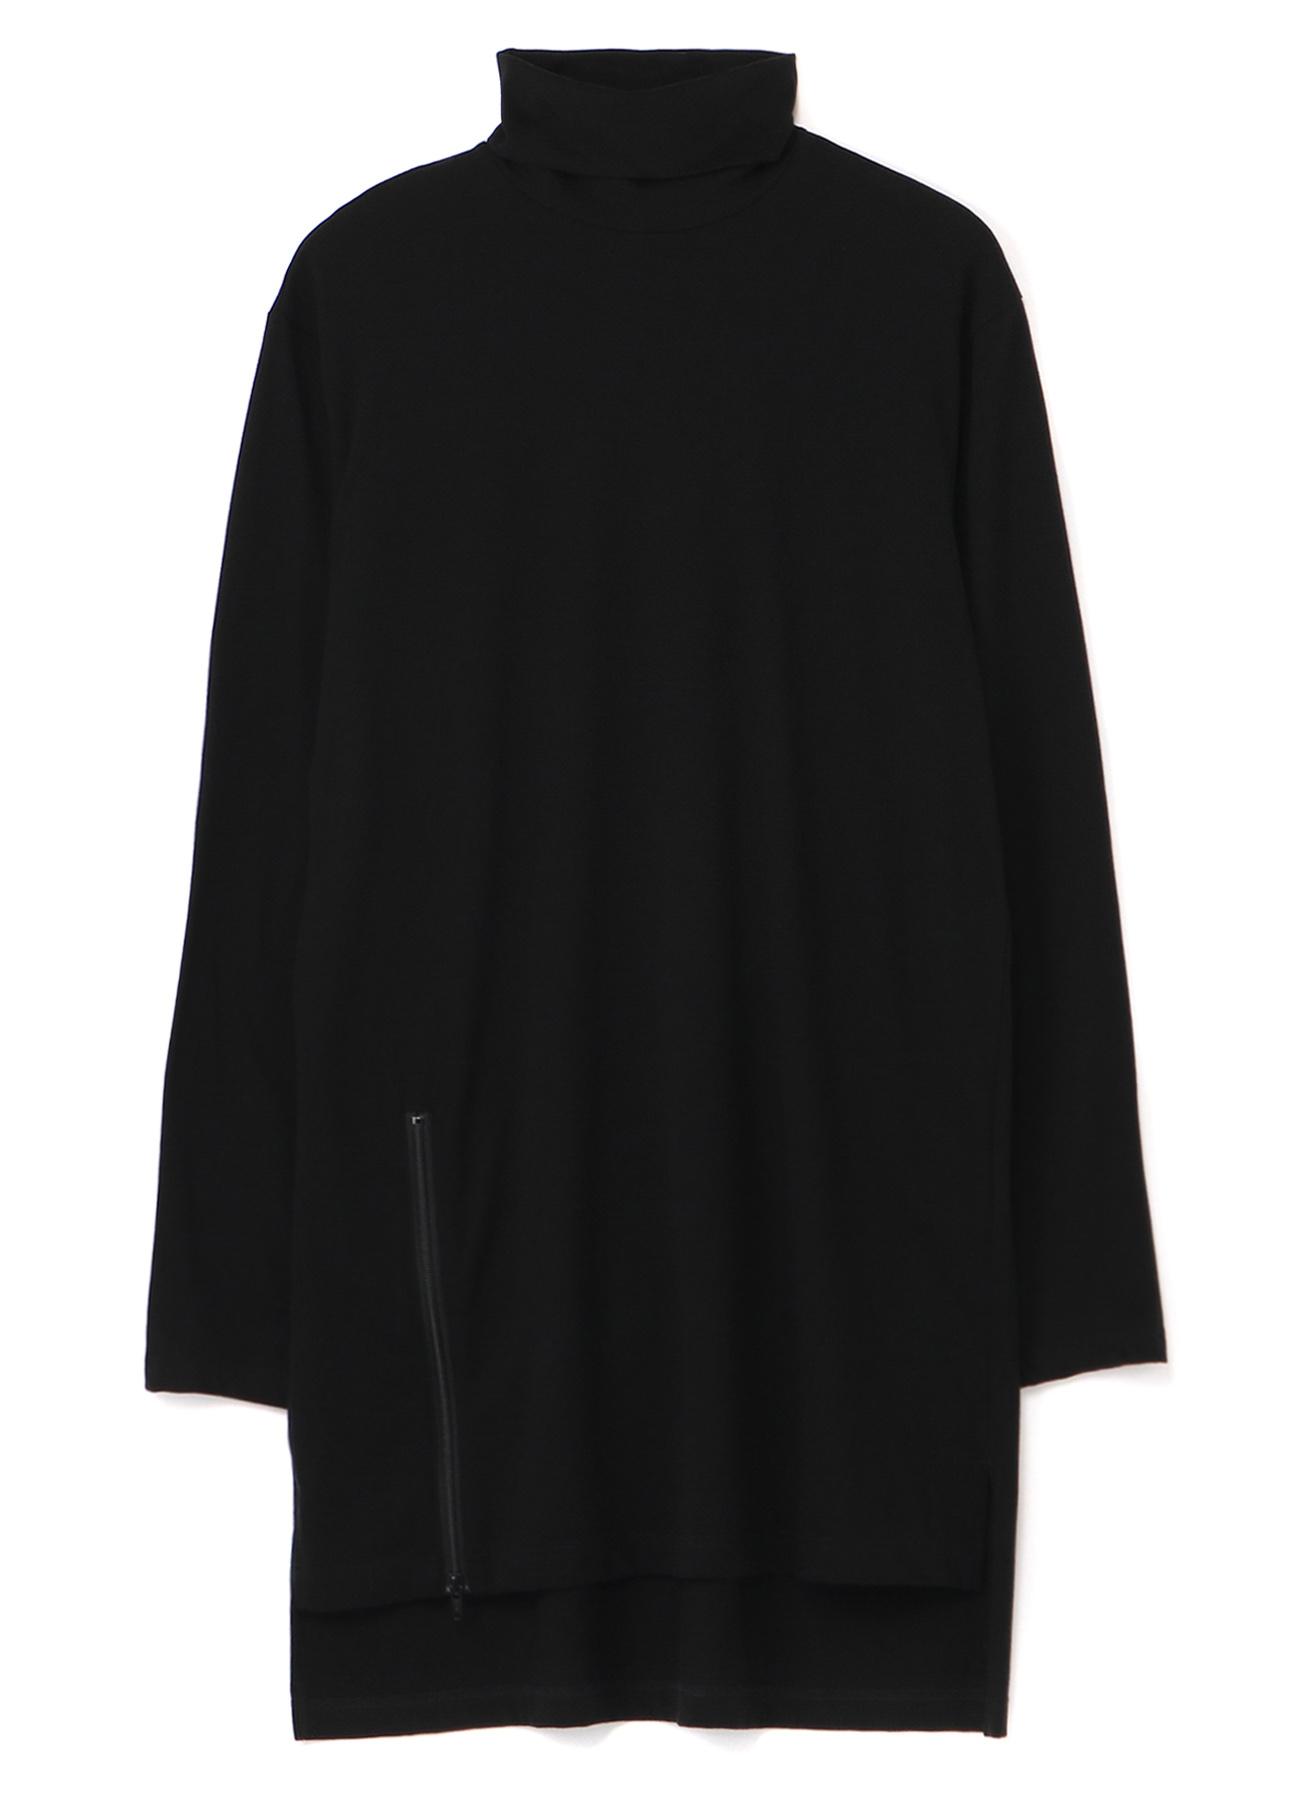 30/Cotton Jersey Zipper Opened Big Turtleneck Cut Sew